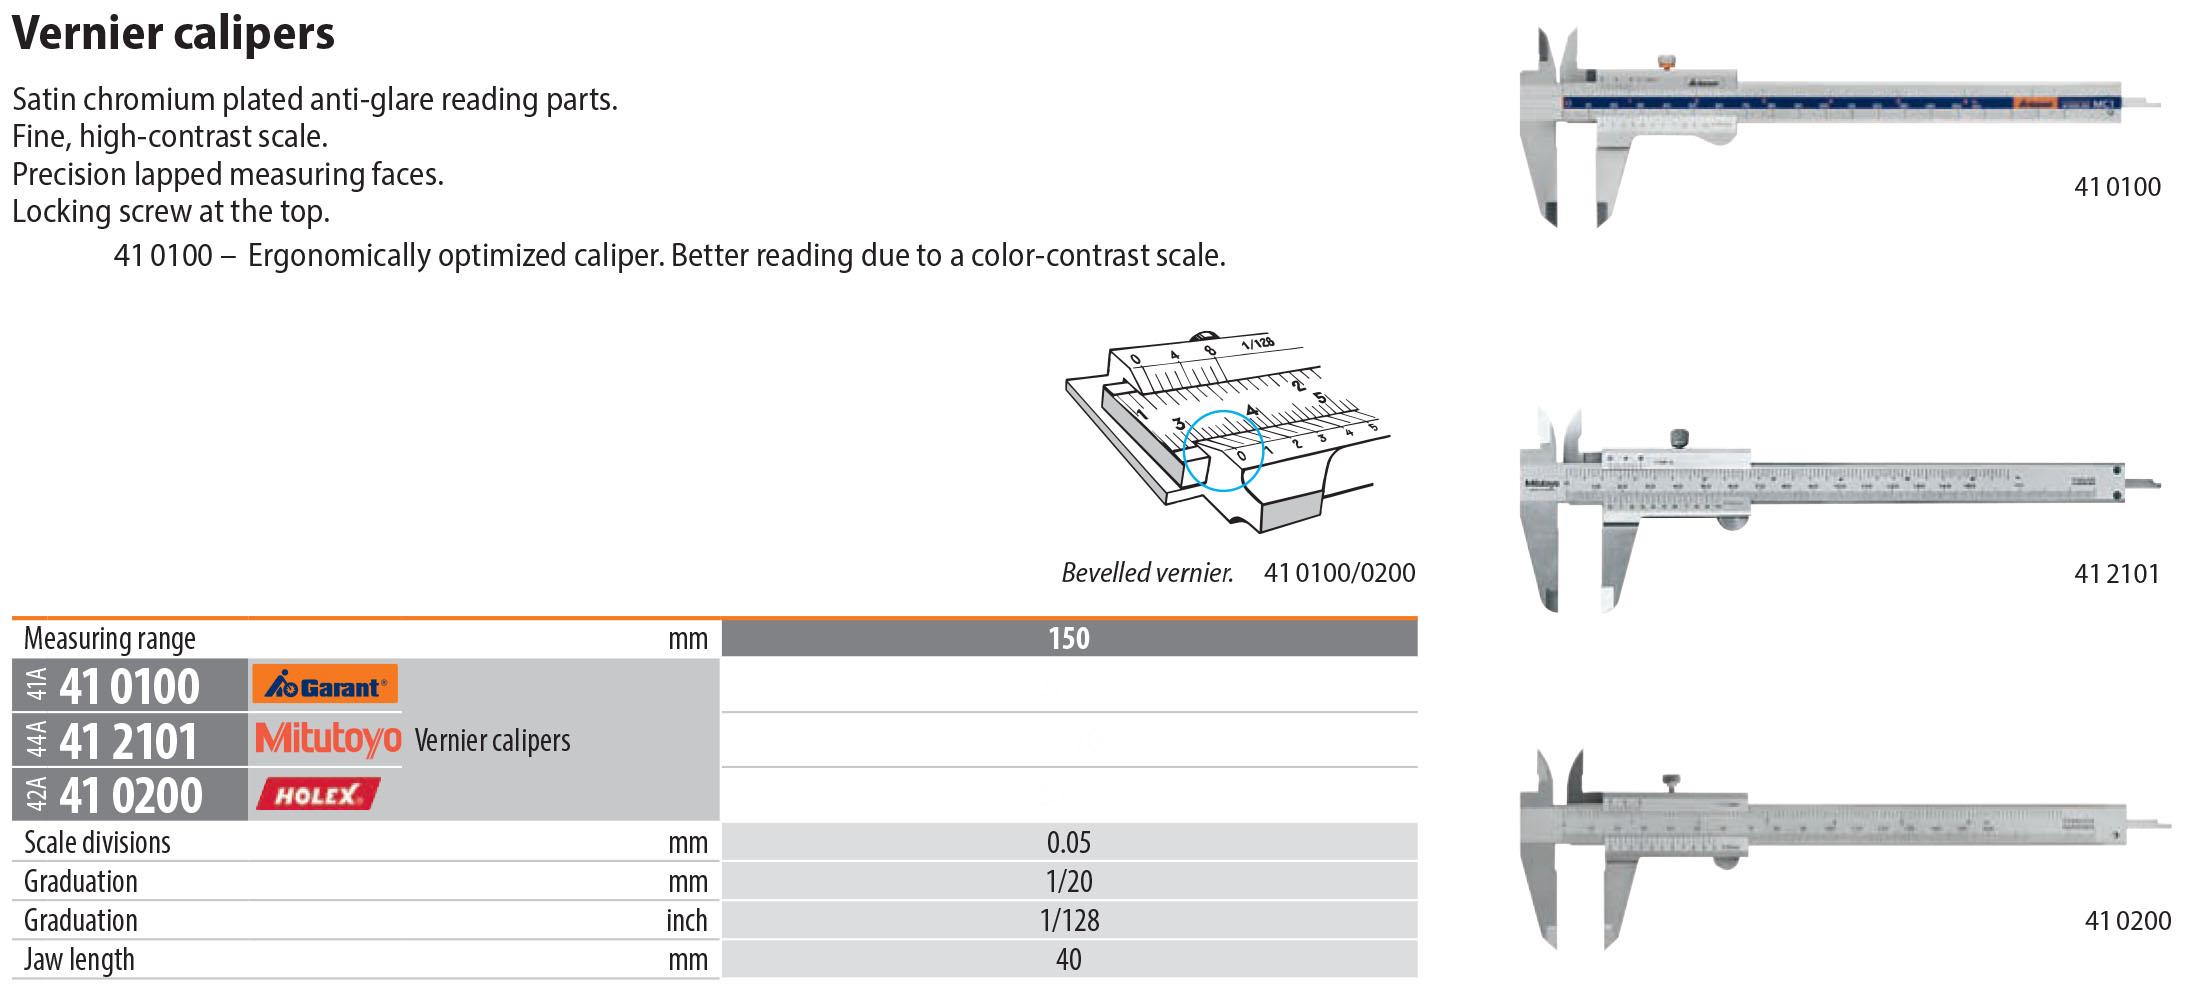 Holex German Vernier Calipers 150 mm Measuring Range